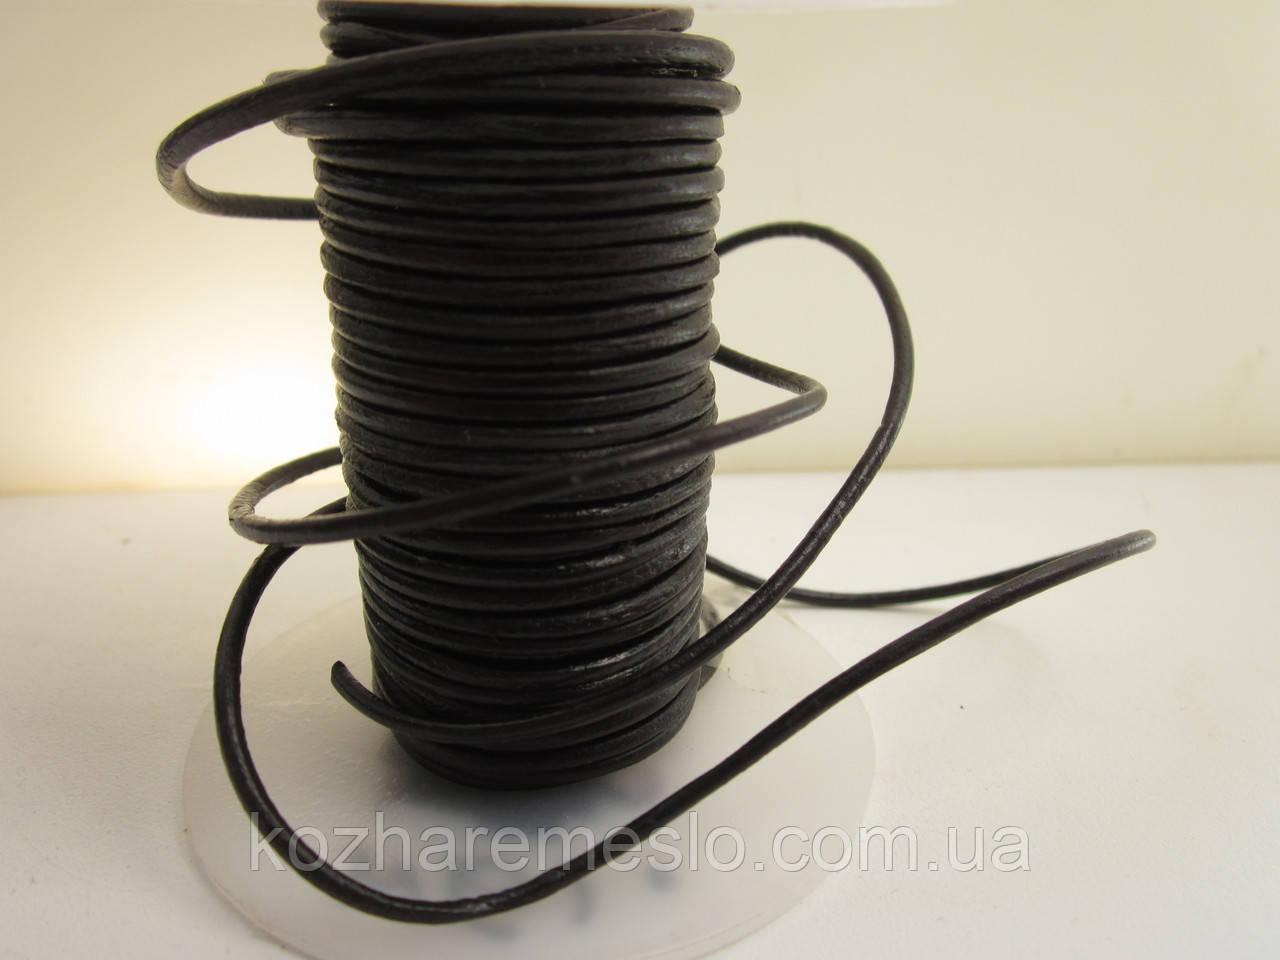 Кожаный шнур 2,5 мм чёрный